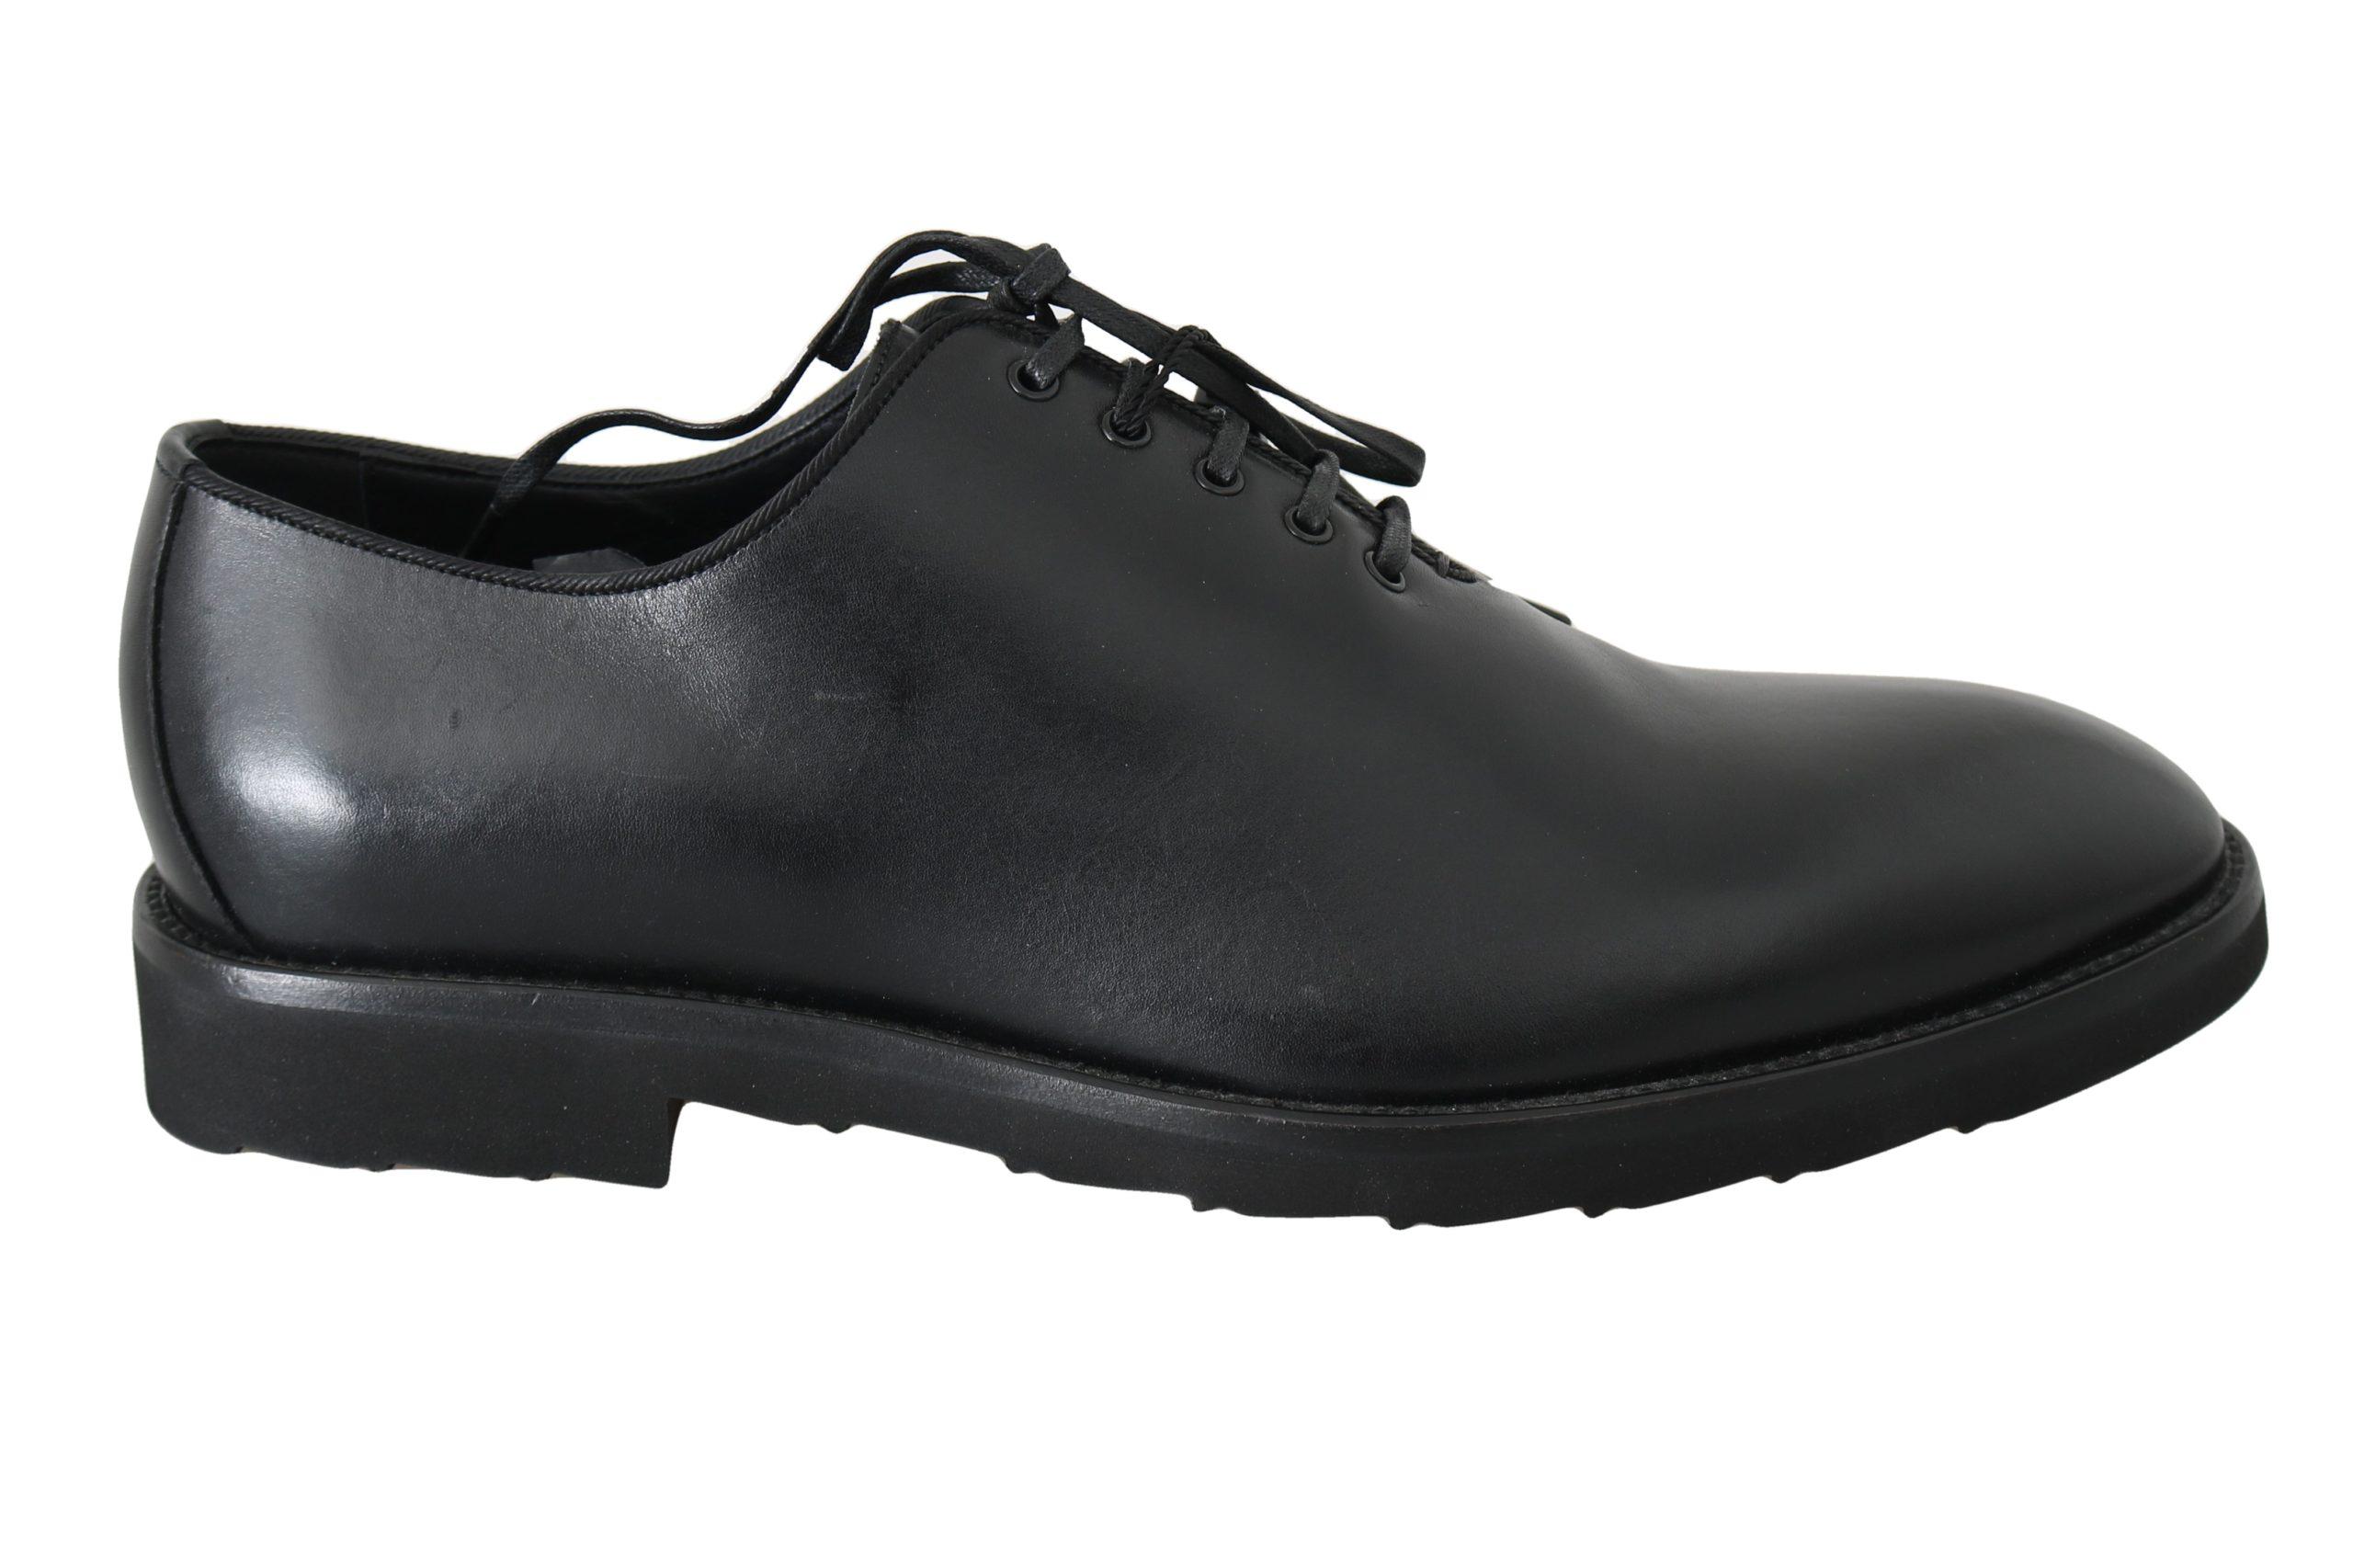 Dolce & Gabbana Men's Leather Derby Dress Shoes Black MV2324 - EU42/US9